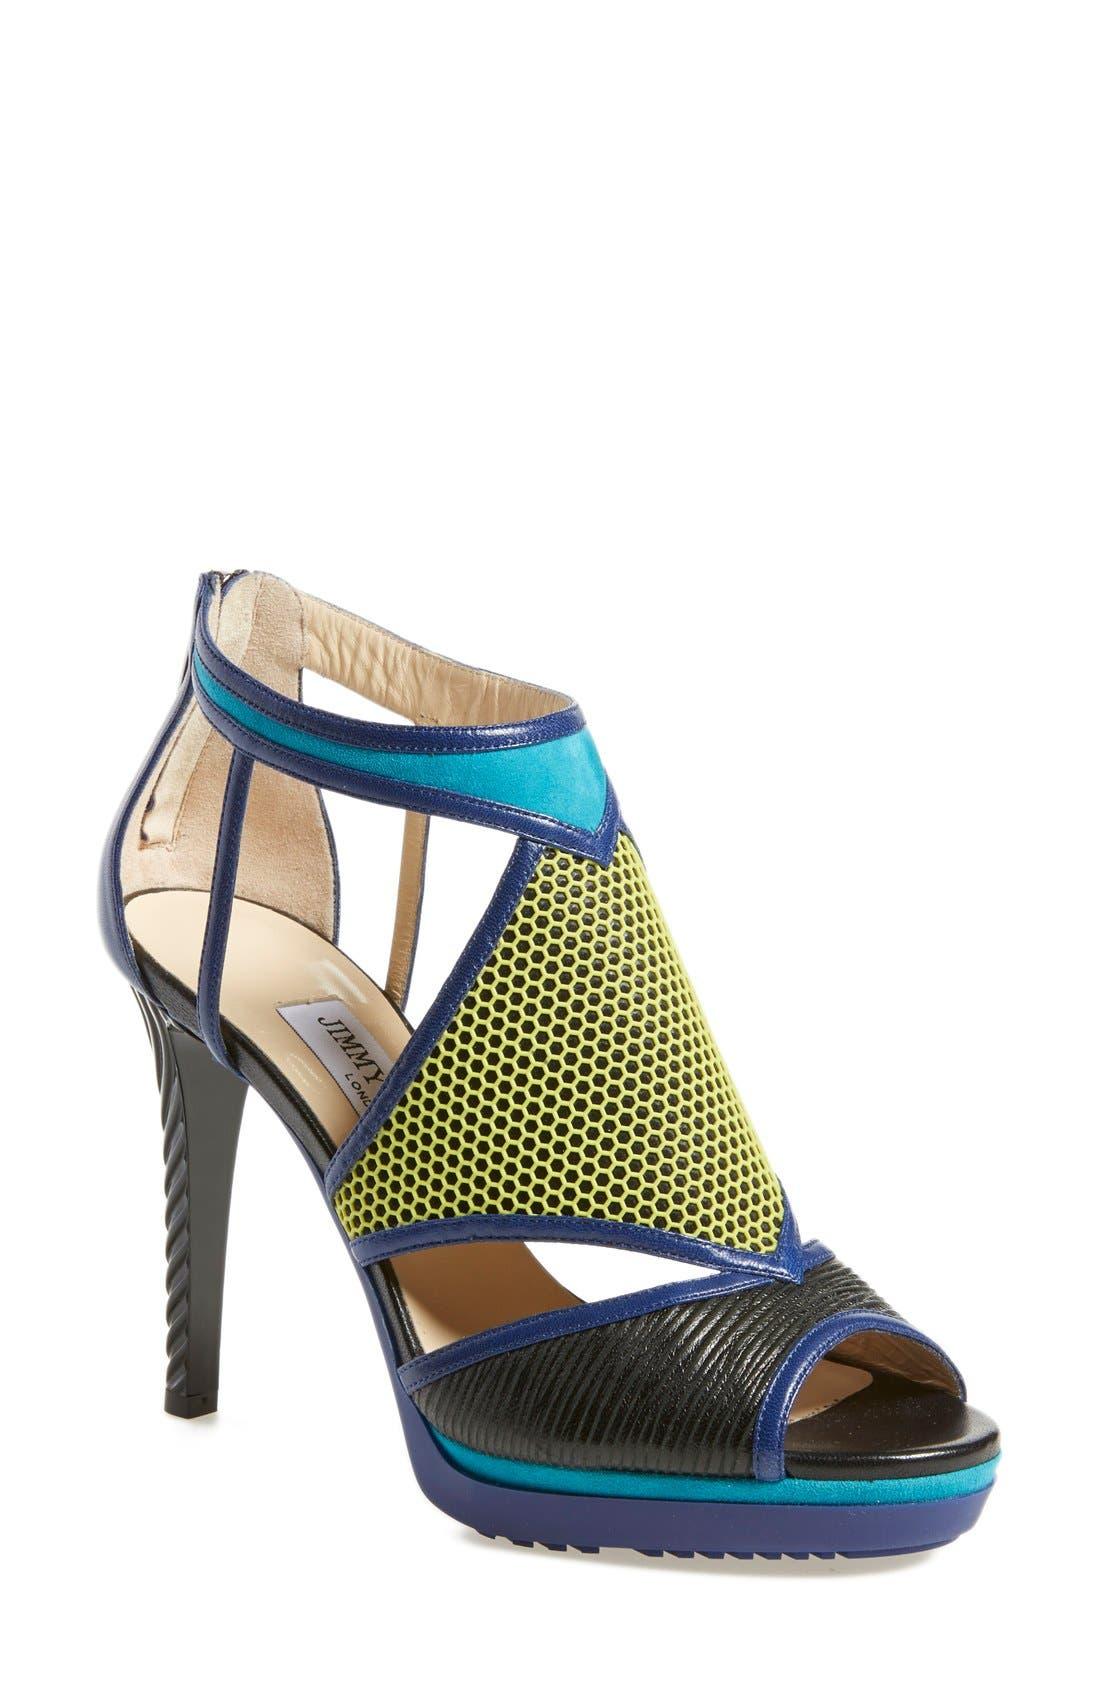 Alternate Image 1 Selected - Jimmy Choo 'Lythe' Honeycomb Sandal (Women)